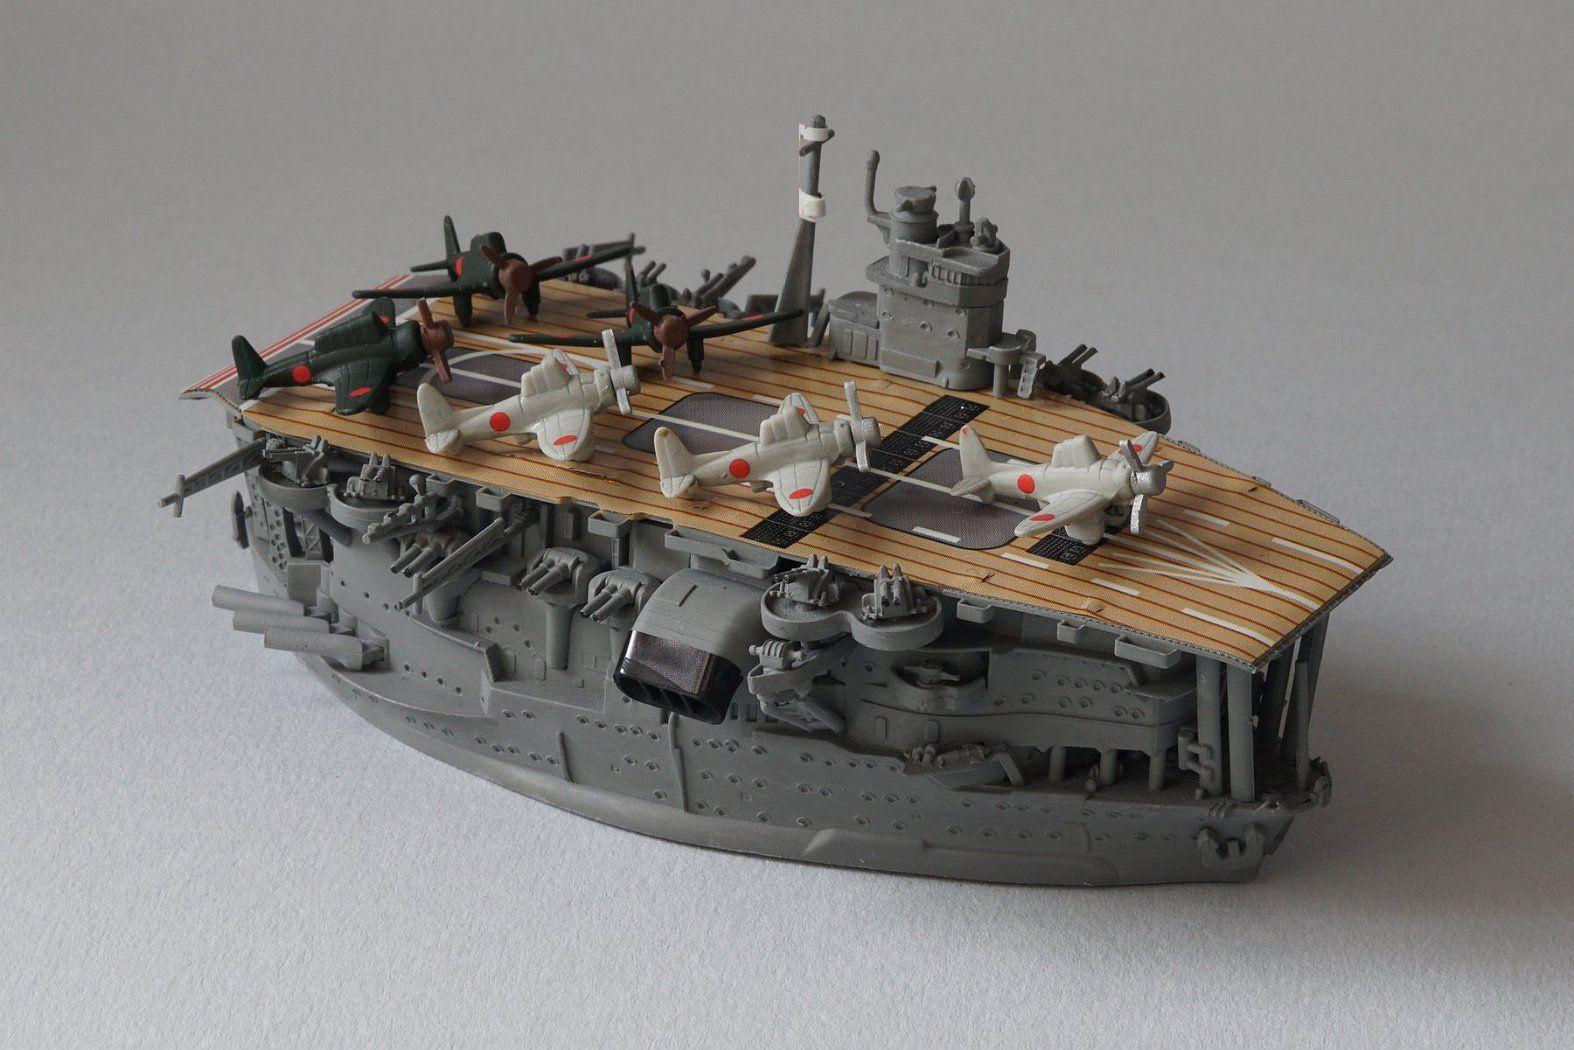 chibi maru fleet - Fan Art and Community Creations - World